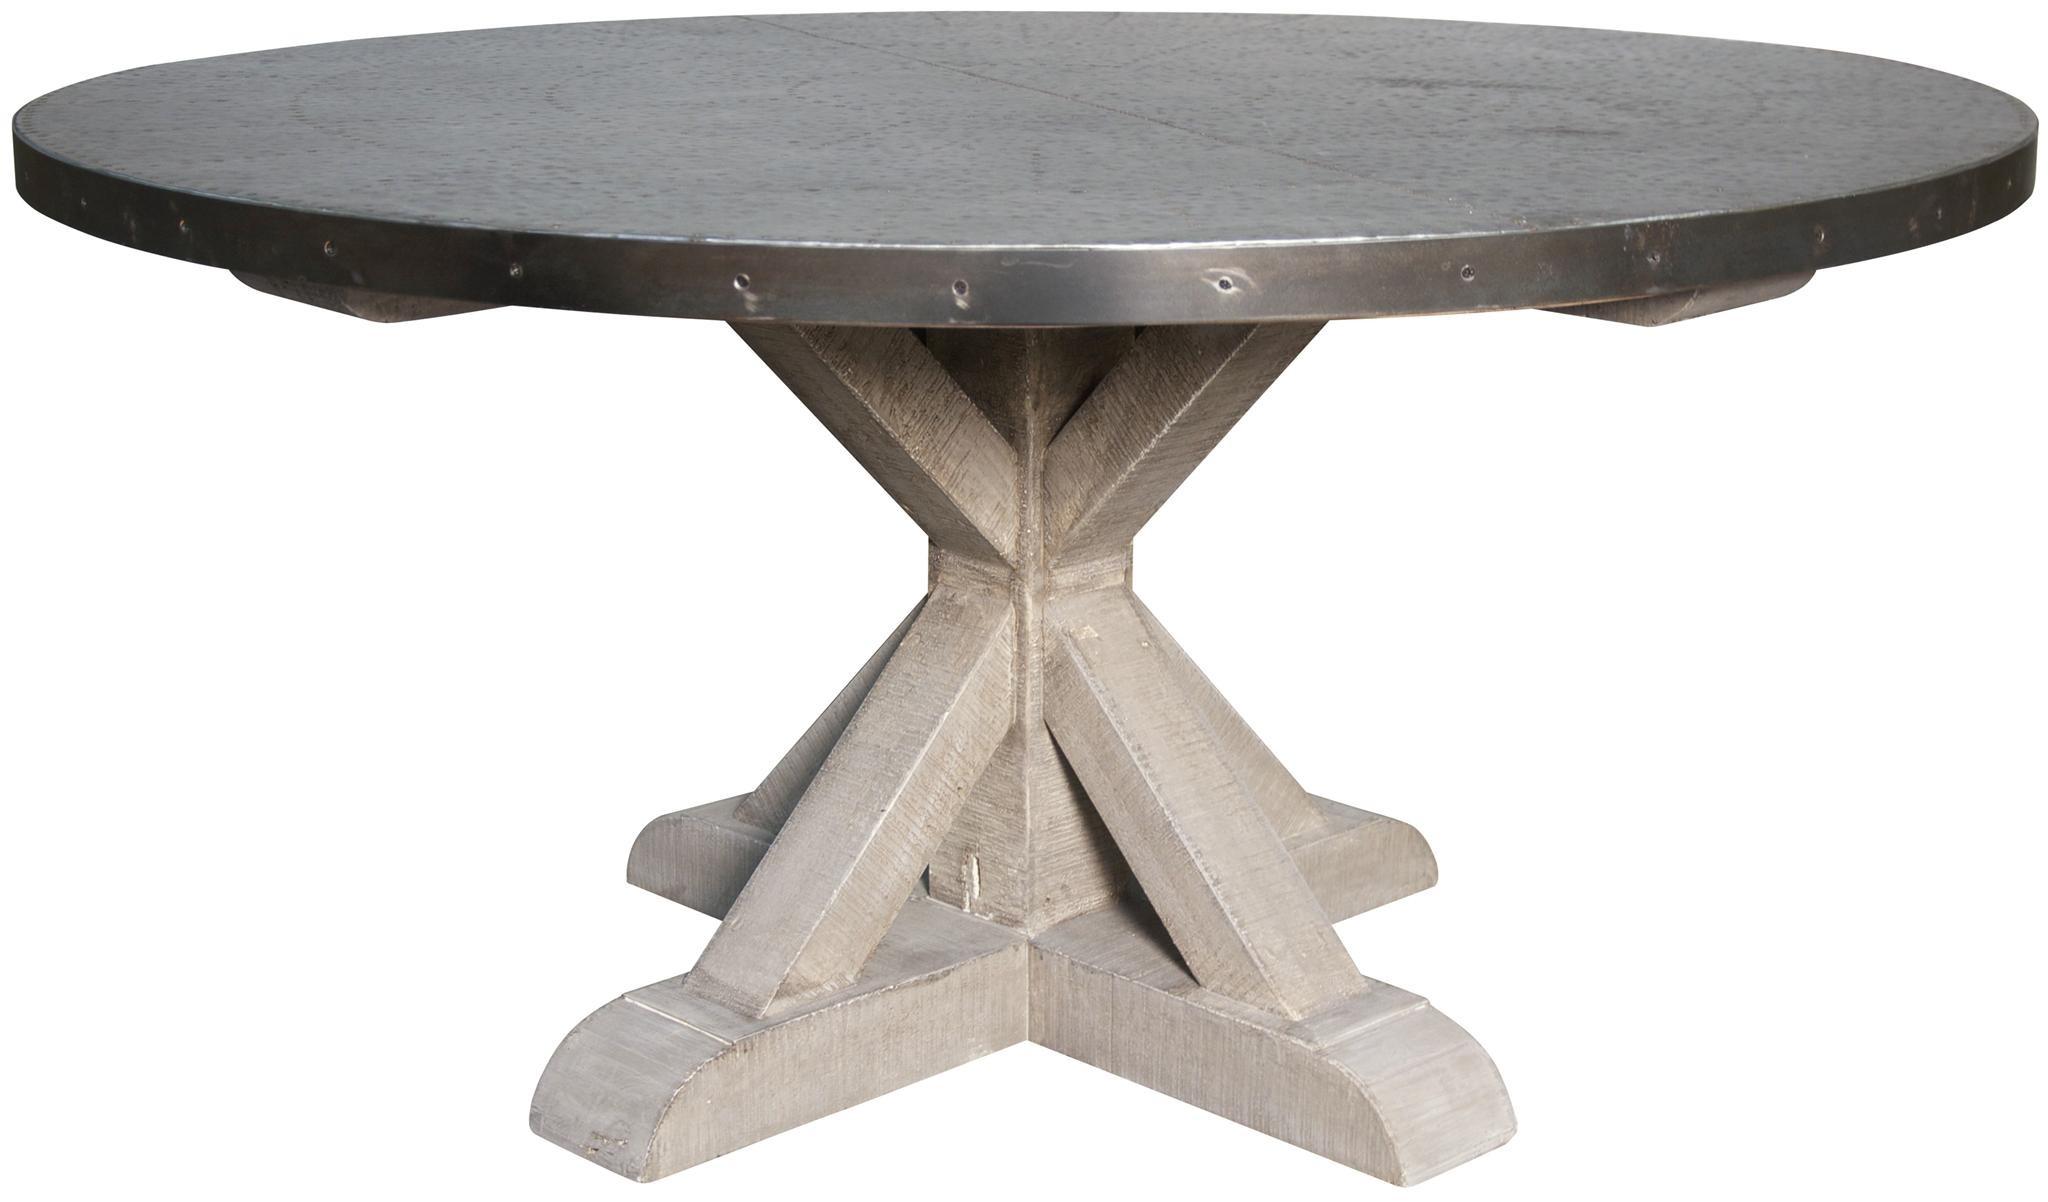 noir zinc top round table Tuvalu Coastal Home Furnishings